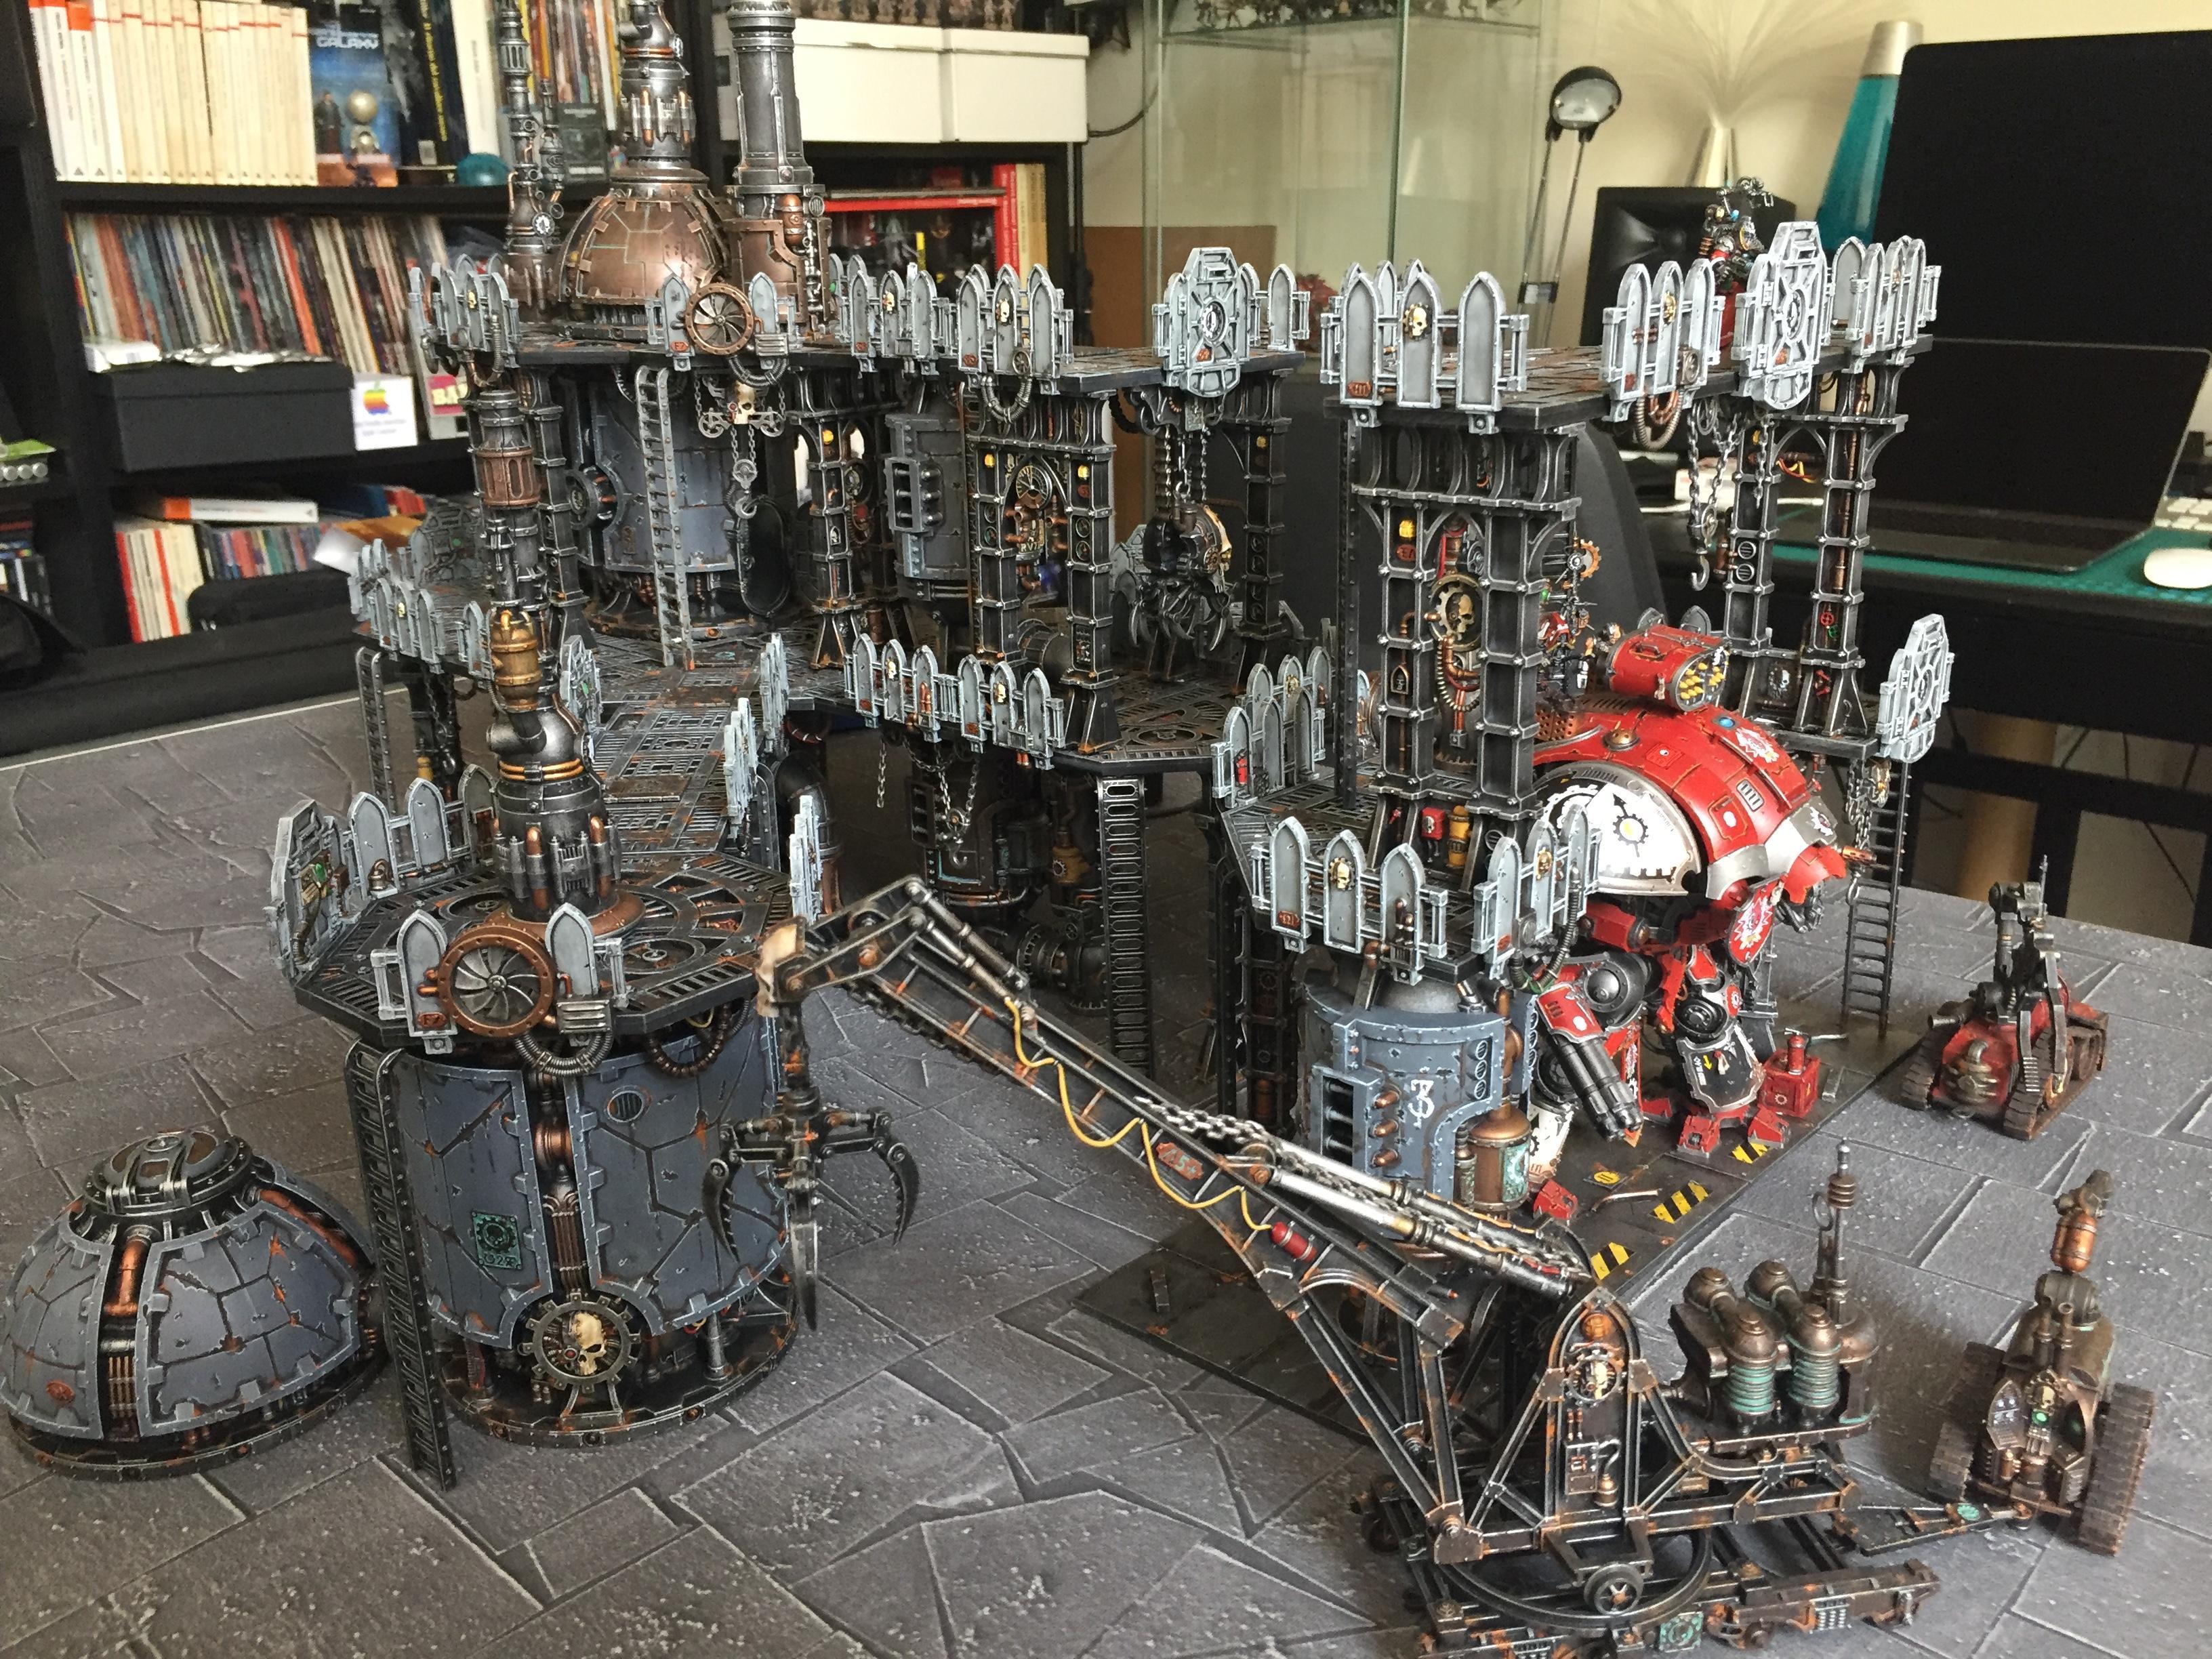 Riccardomargarolo, Sectormechanicus, Shadowwar, Warhammer 40,000, Warhammer40000